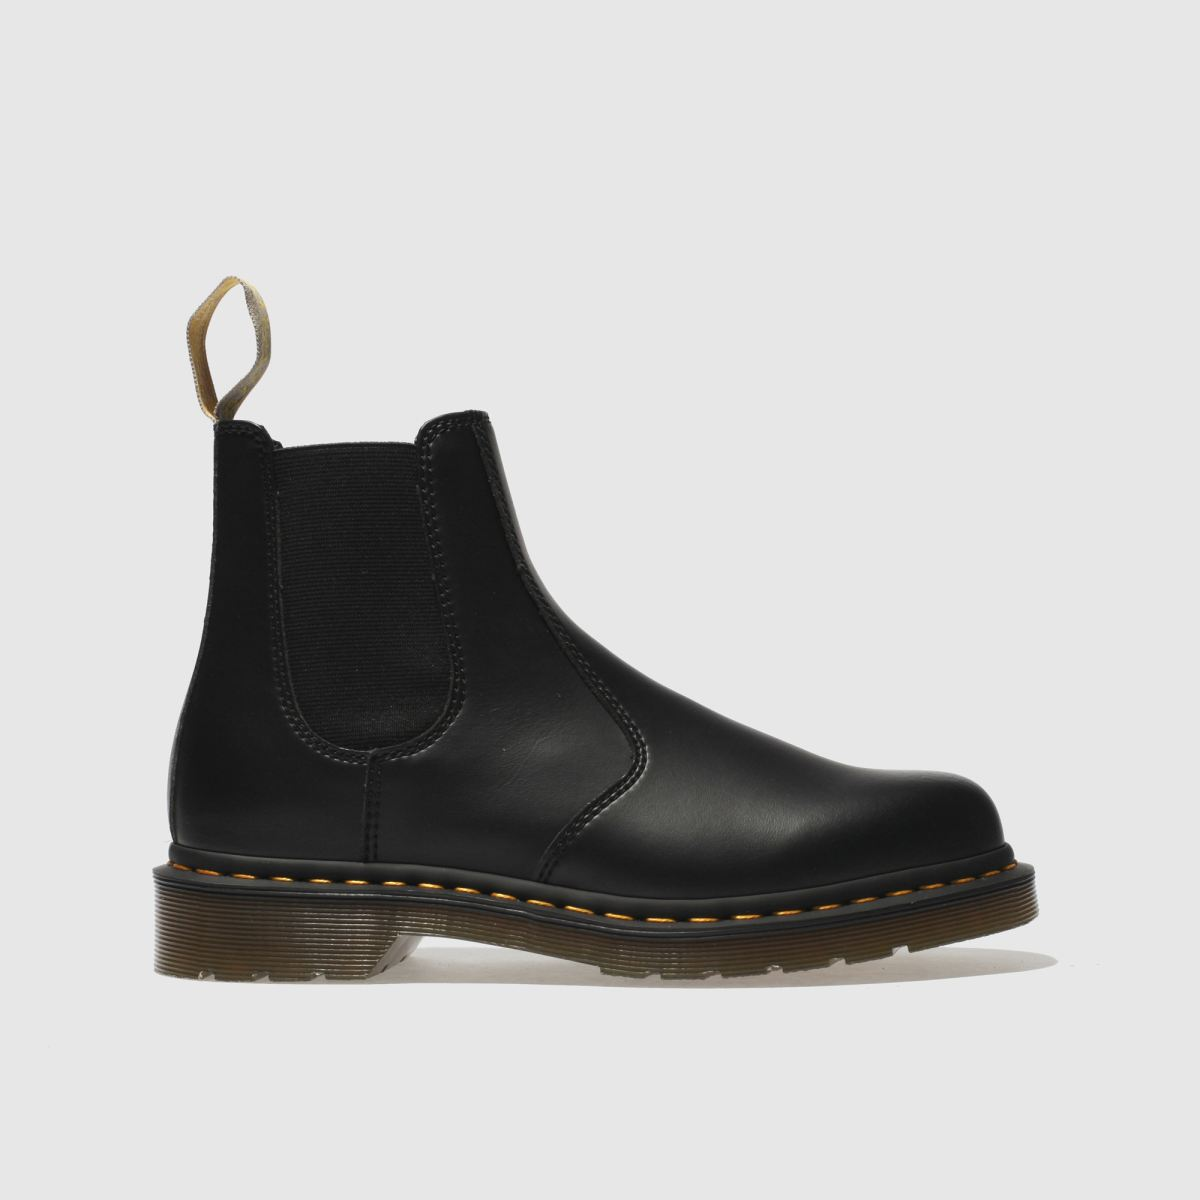 Dr Martens Black 2976 Vegan Chelsea Boot Boots